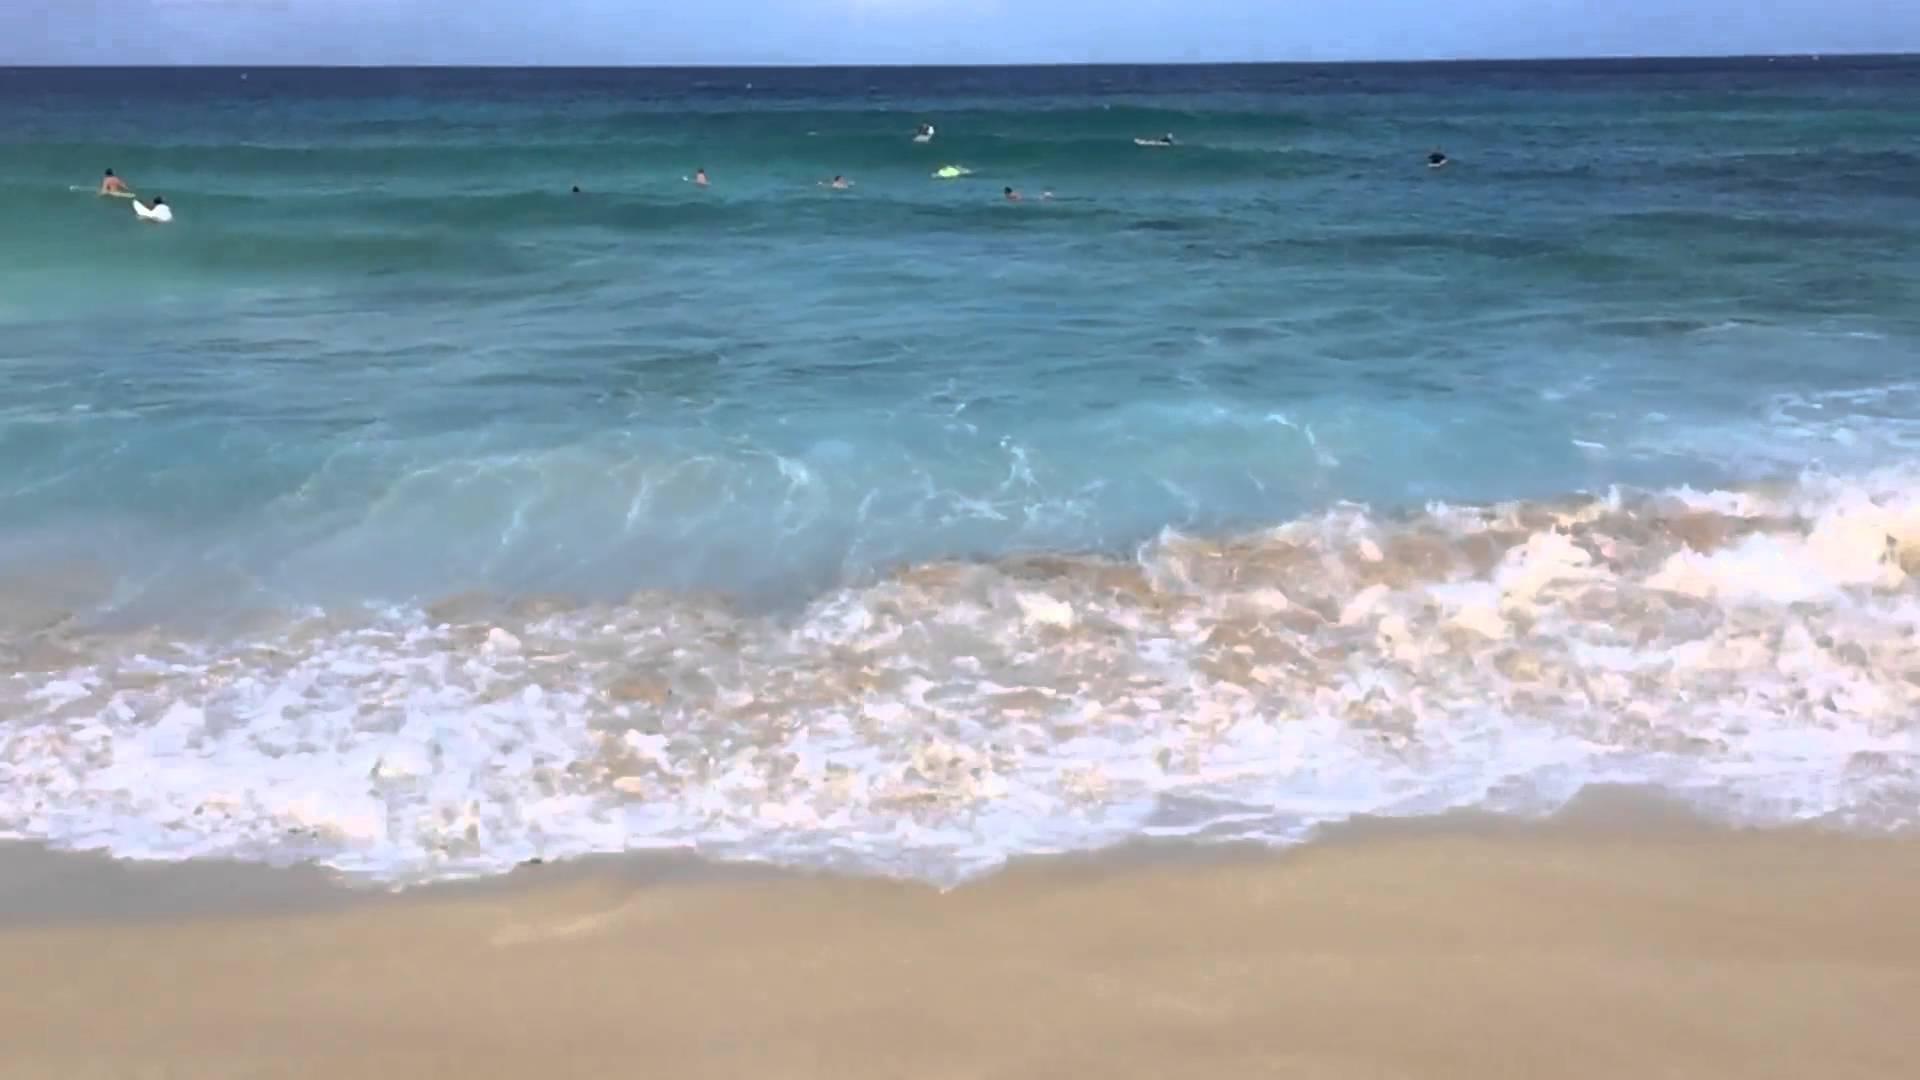 Bonzai Pipeline Surf - small waves 12-26-15 - YouTube